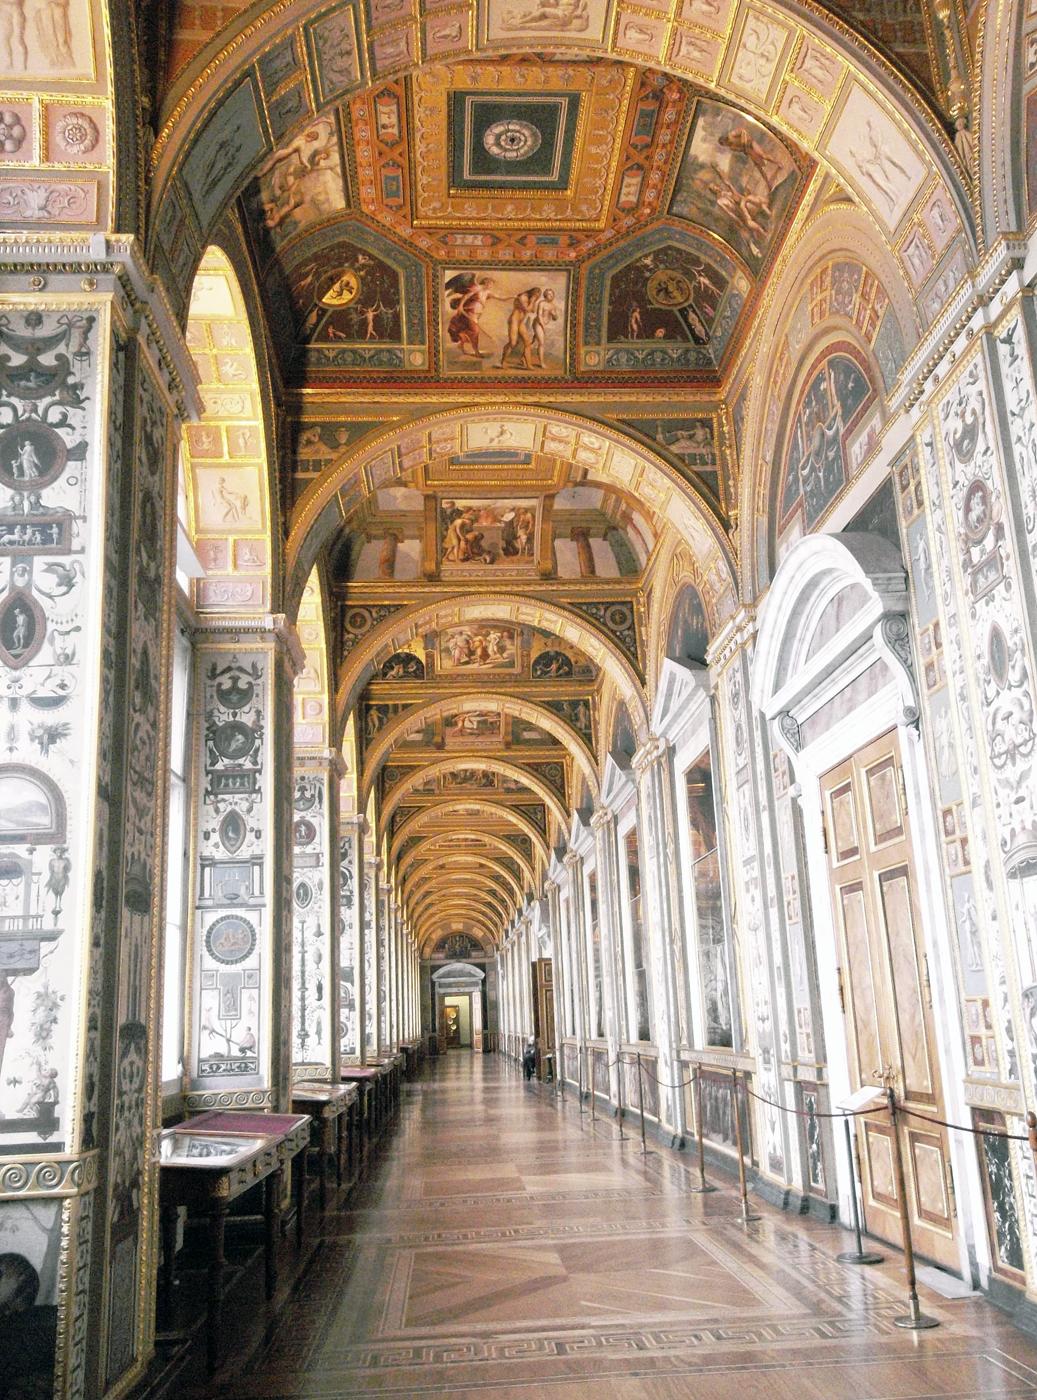 Лоджии Рафаэля в здании Большого Эрмитажа. Фото: Tura8 (Wikimedia Commons)